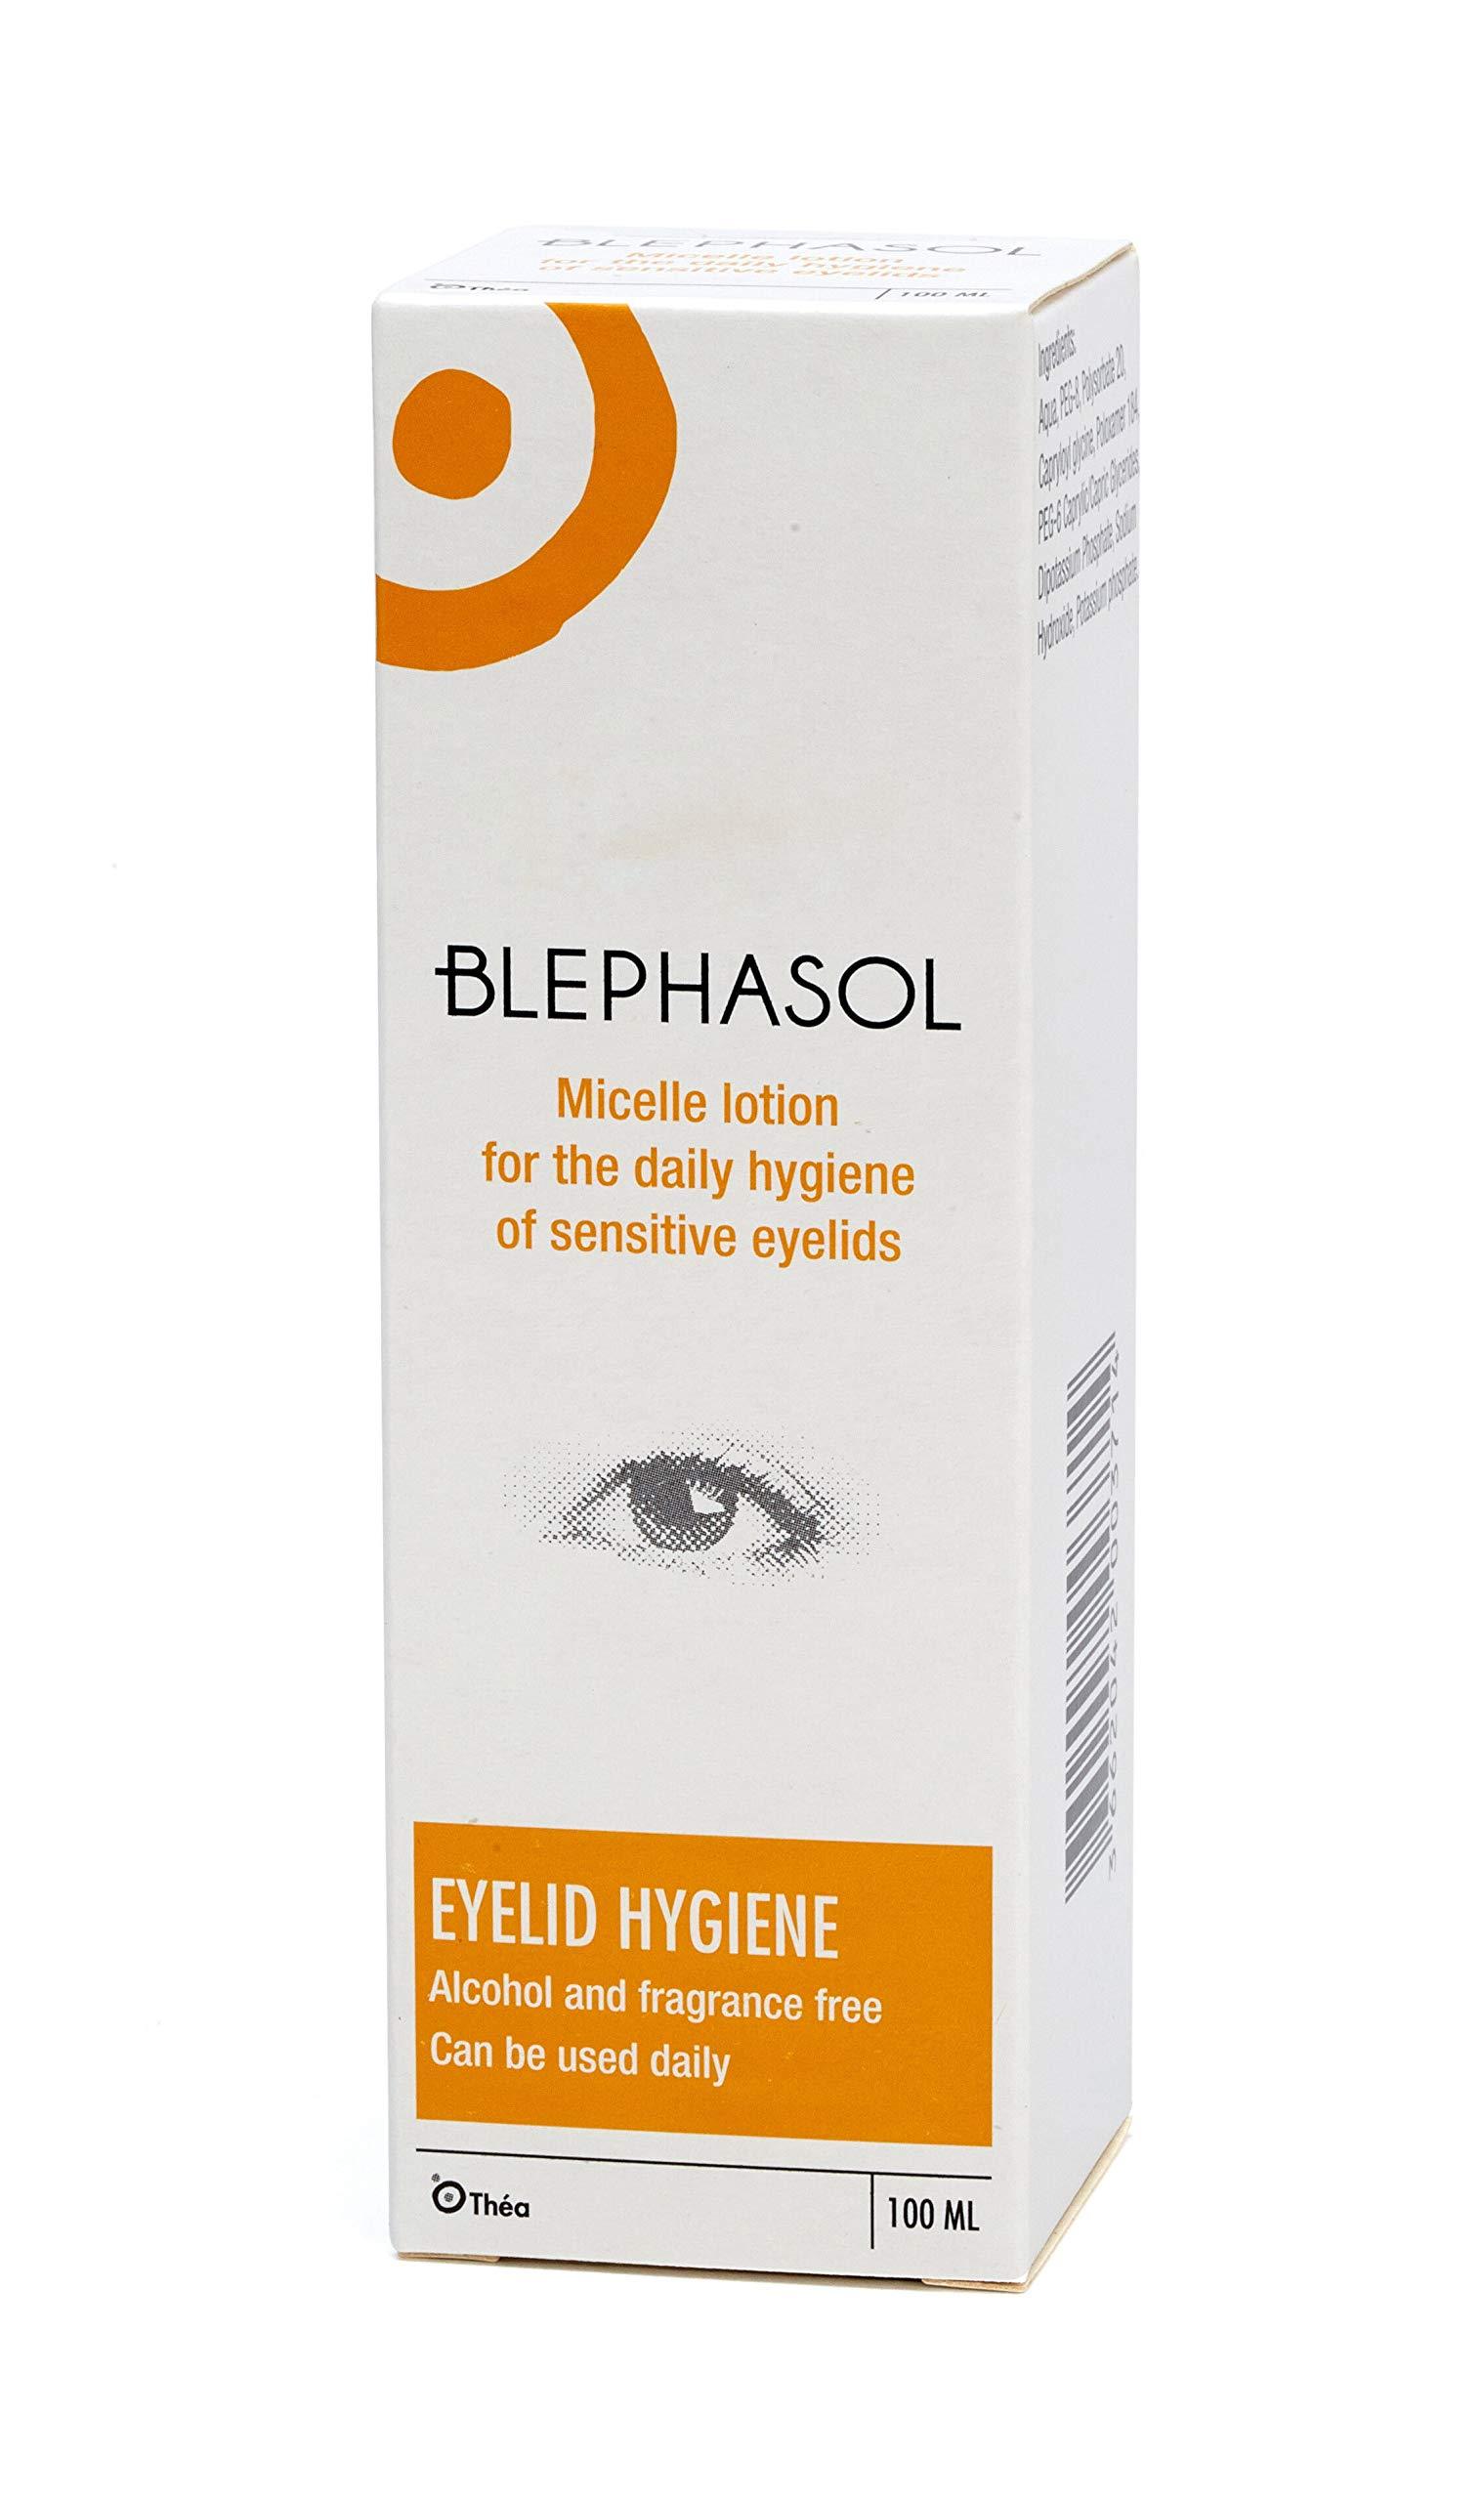 Blephasol 100ml Sensitive Eyelids Eye Lotion